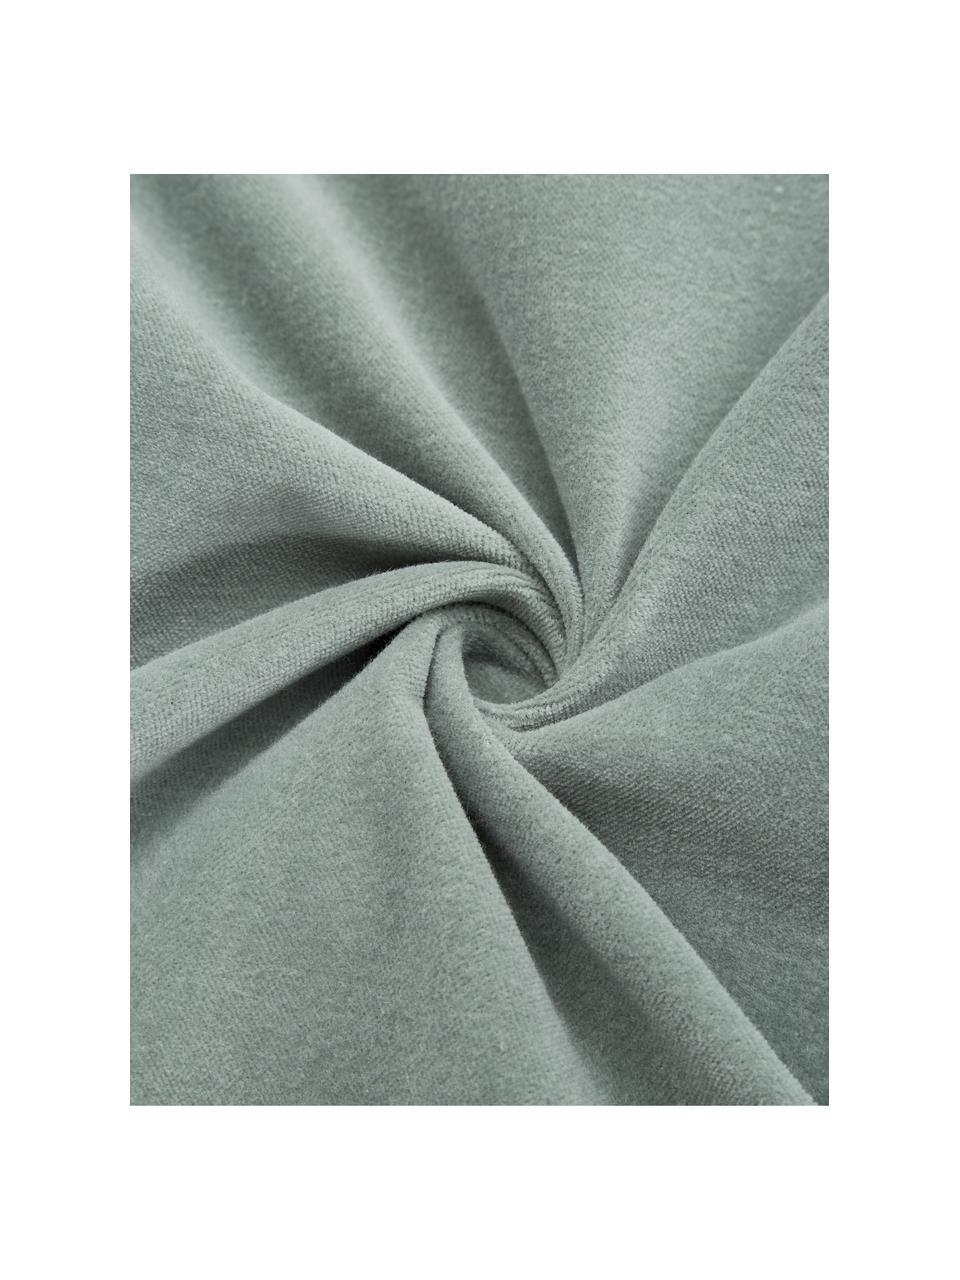 Federa arredo in velluto verde salvia Sina, Velluto (100% cotone), Verde, Larg. 45 x Lung. 45 cm